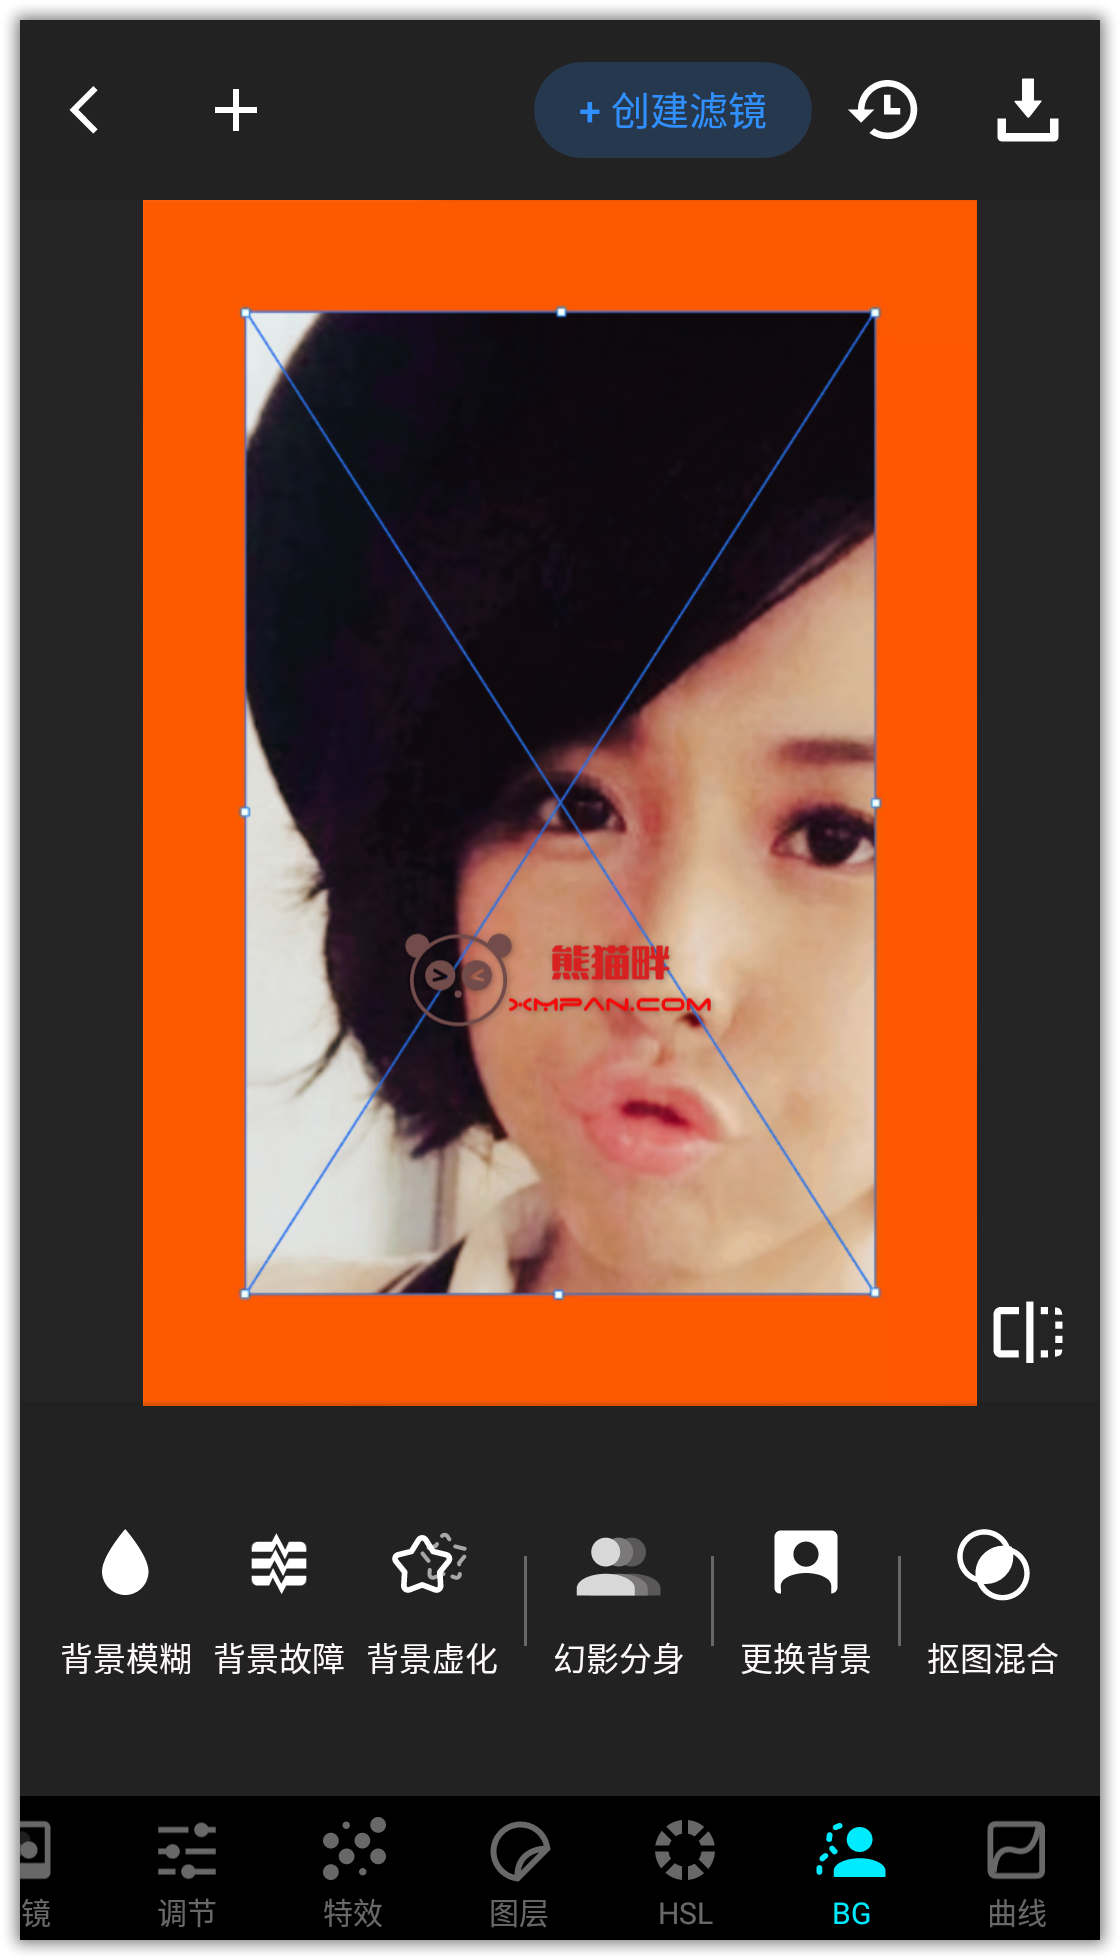 Android 照片编辑器,图片滤镜 Lumii v1.441.88 Pro